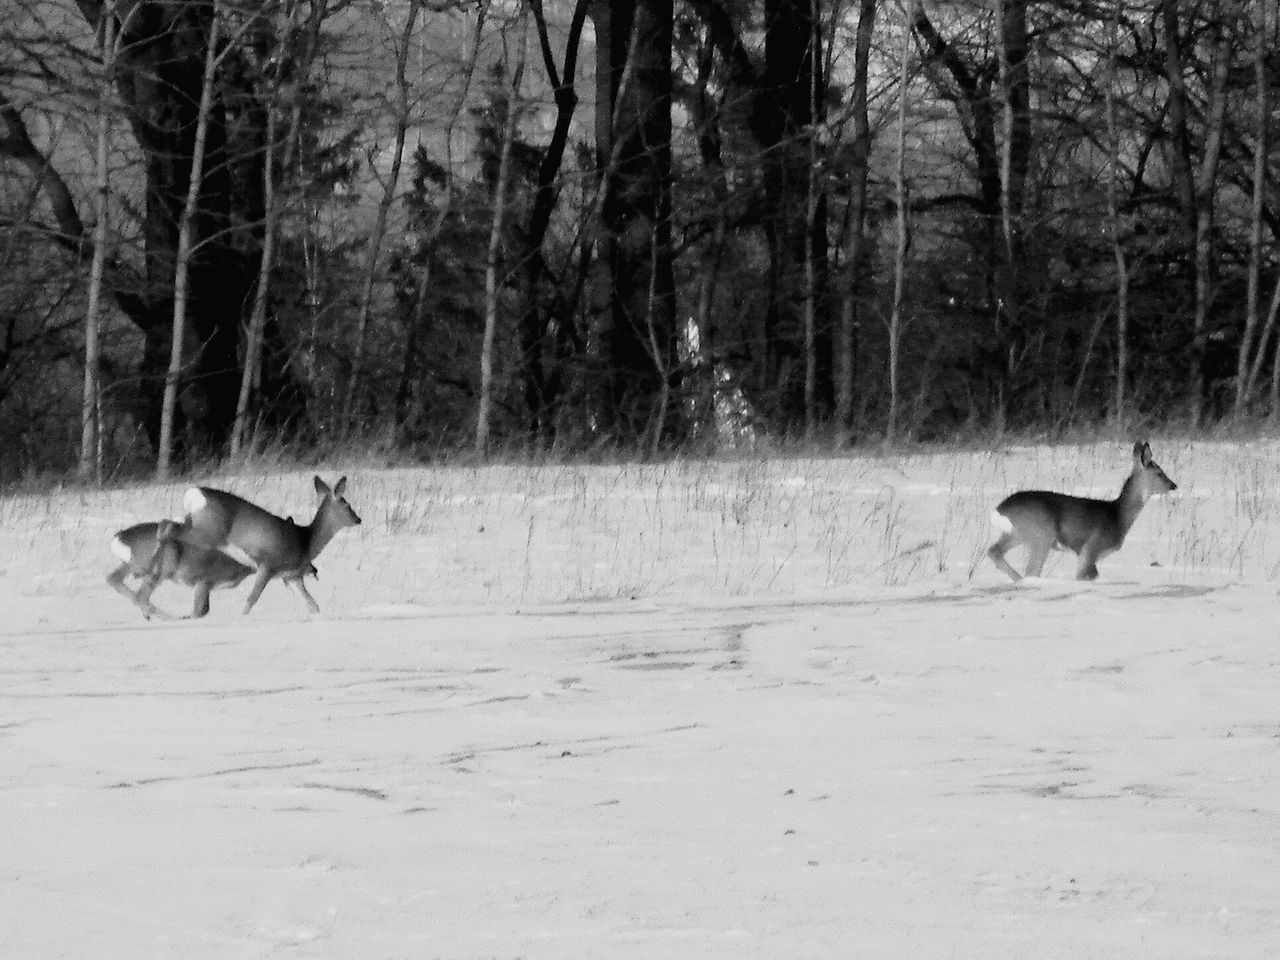 Outdoors Eyeemphoto Kodak Easyshare Polska Podkarpacie Mammals Roe Deer Mróz Sarny Kodak No People Ssaki Zwierzęta Zimno Animal Themes Black And White Blackandwhite Photography